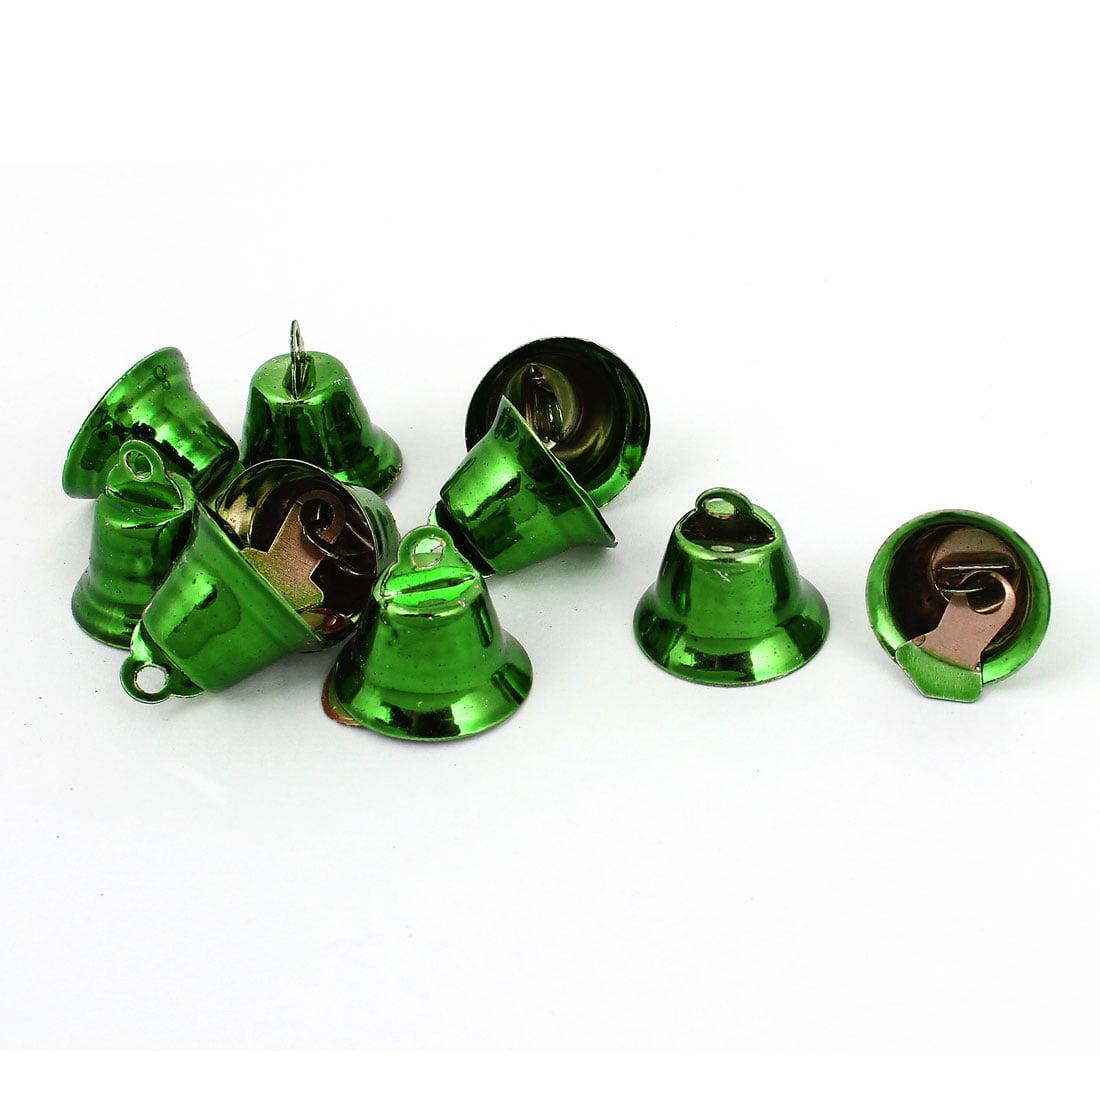 10 Pcs Metal 15mm Dia Christmas Tree Ring Bell Hanging Decoration Green - image 1 de 1